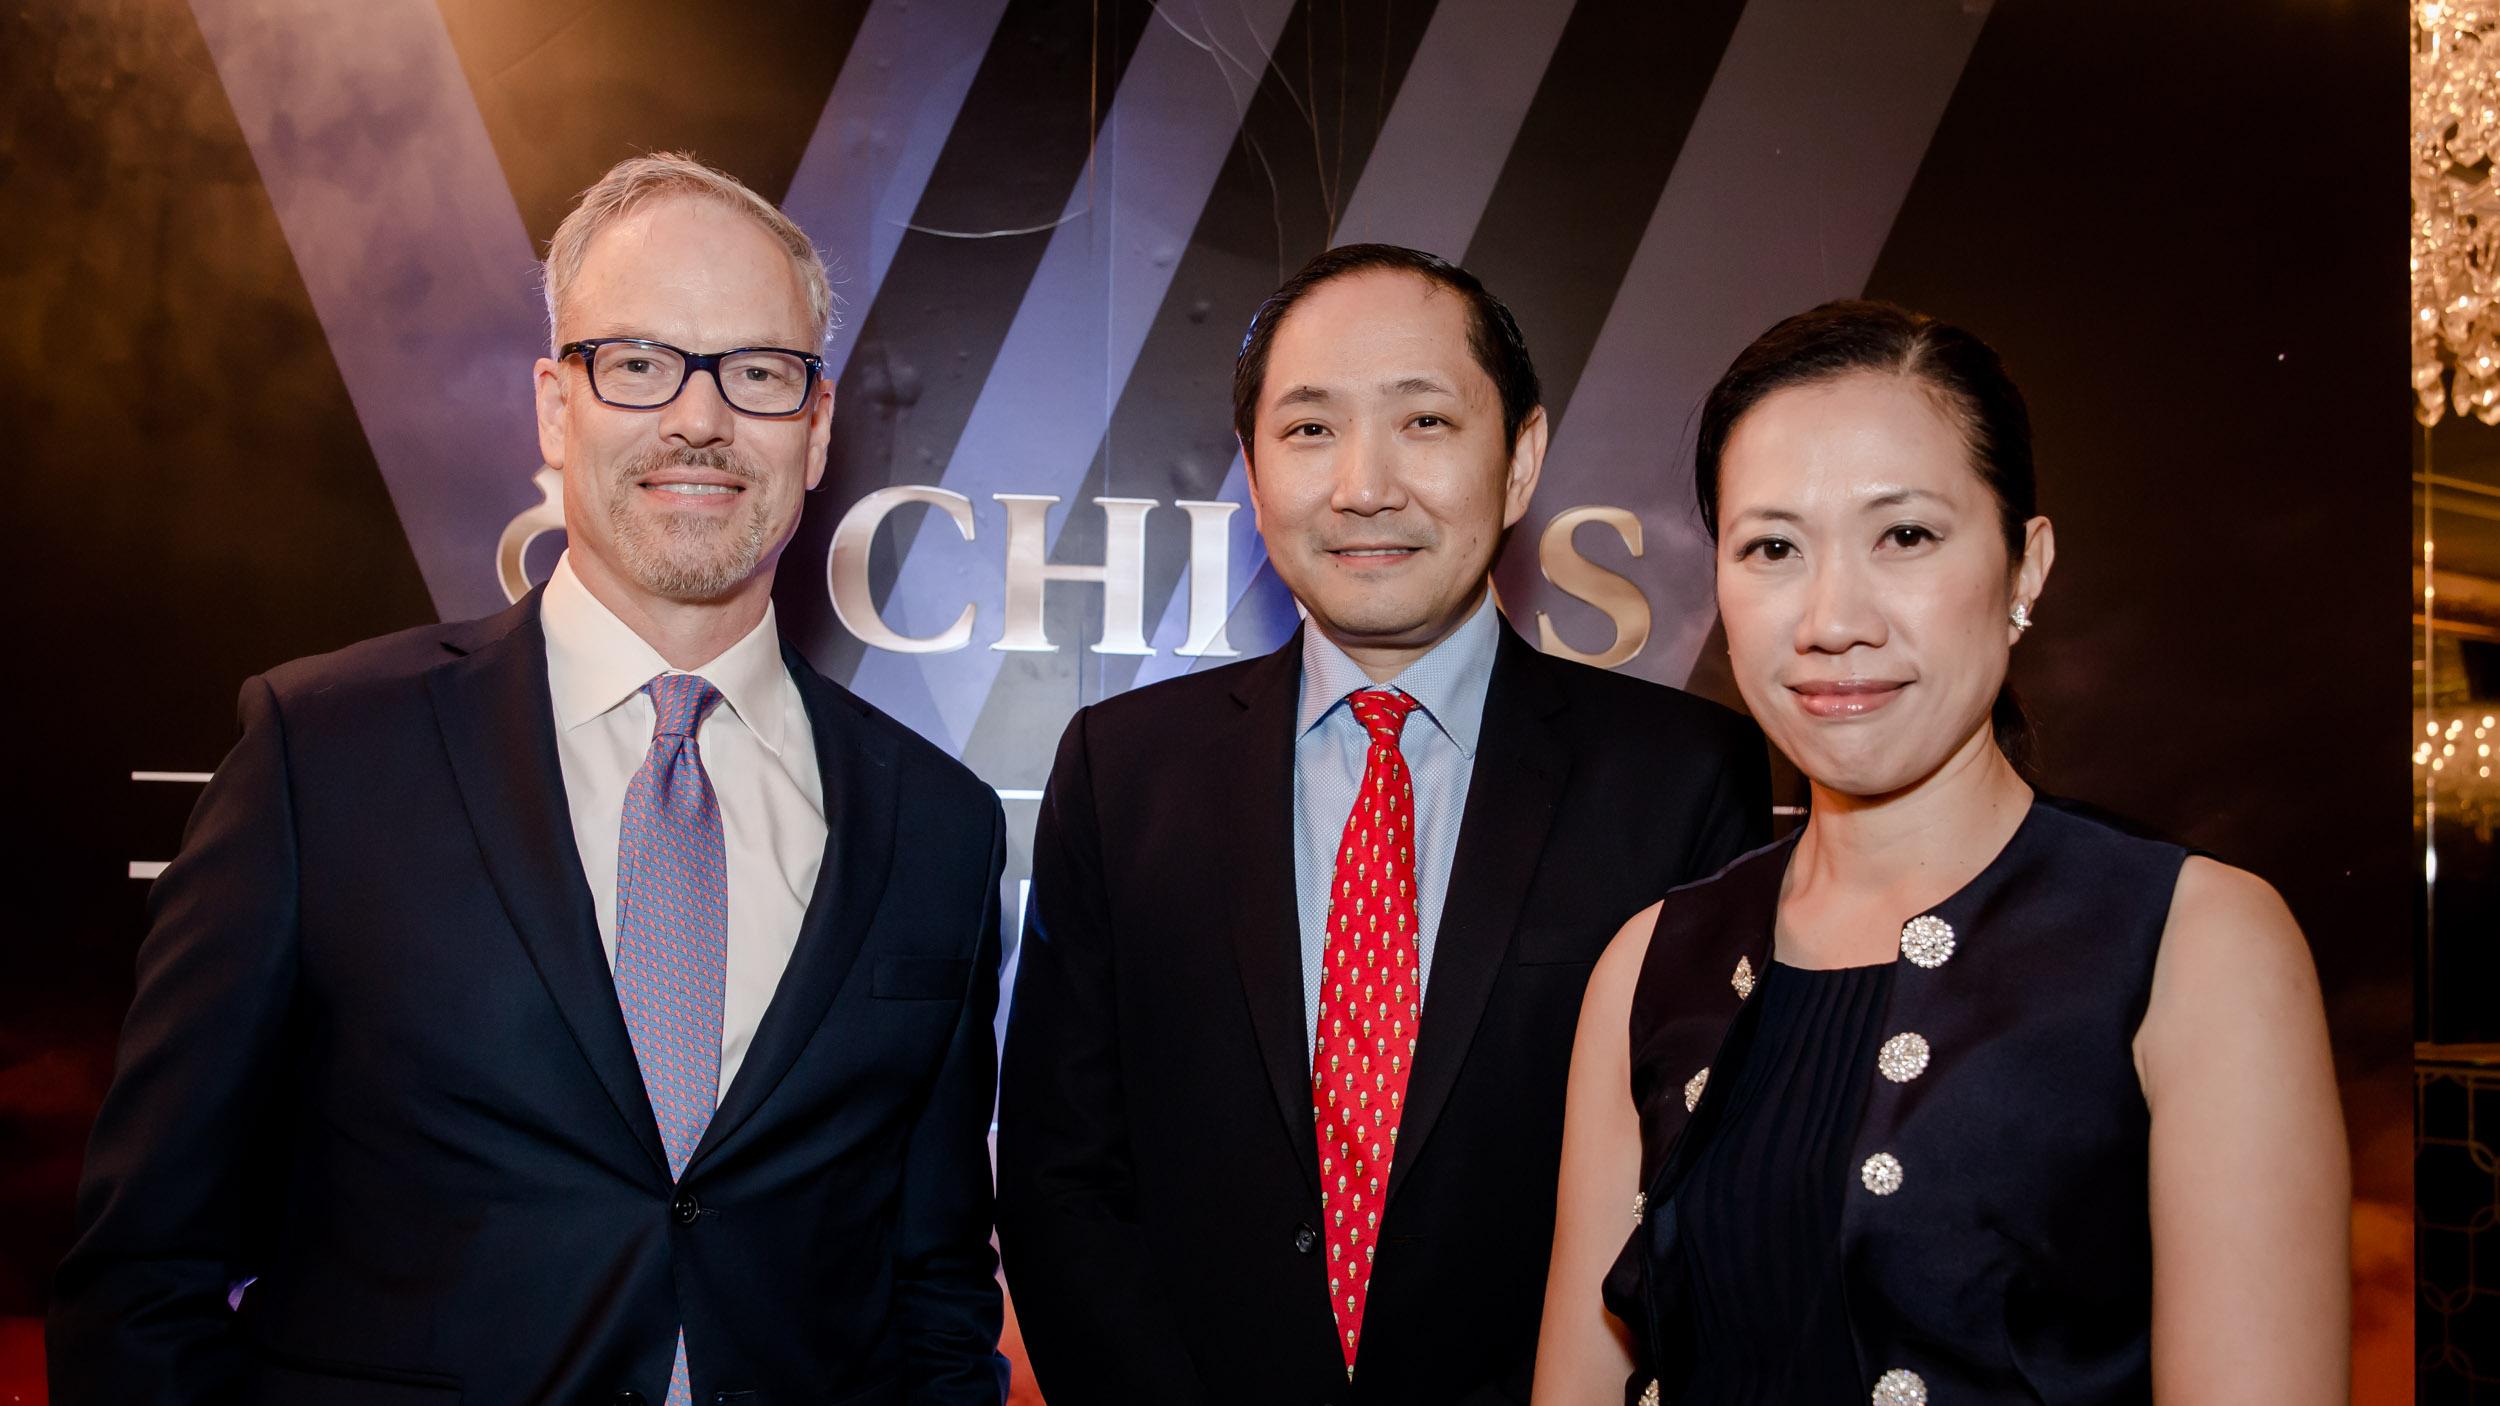 Scott Lawson of SOW Asia, Philo Alto of AVA, and Doris Leung of Diamond Cab